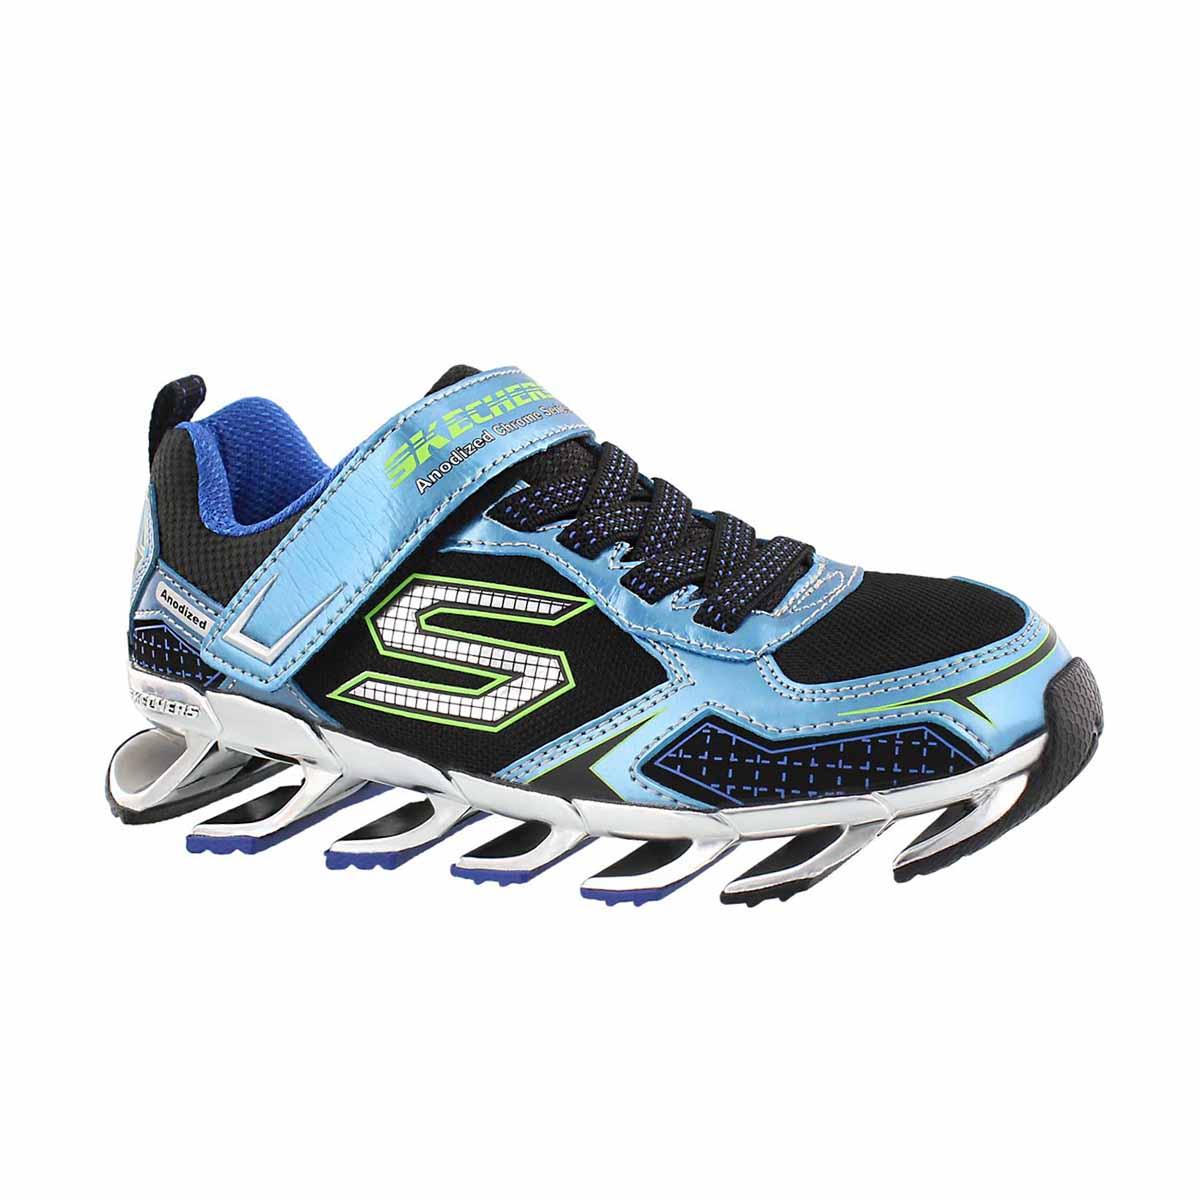 Boys' MEGA BLADE 2.0 blue/black sneakers